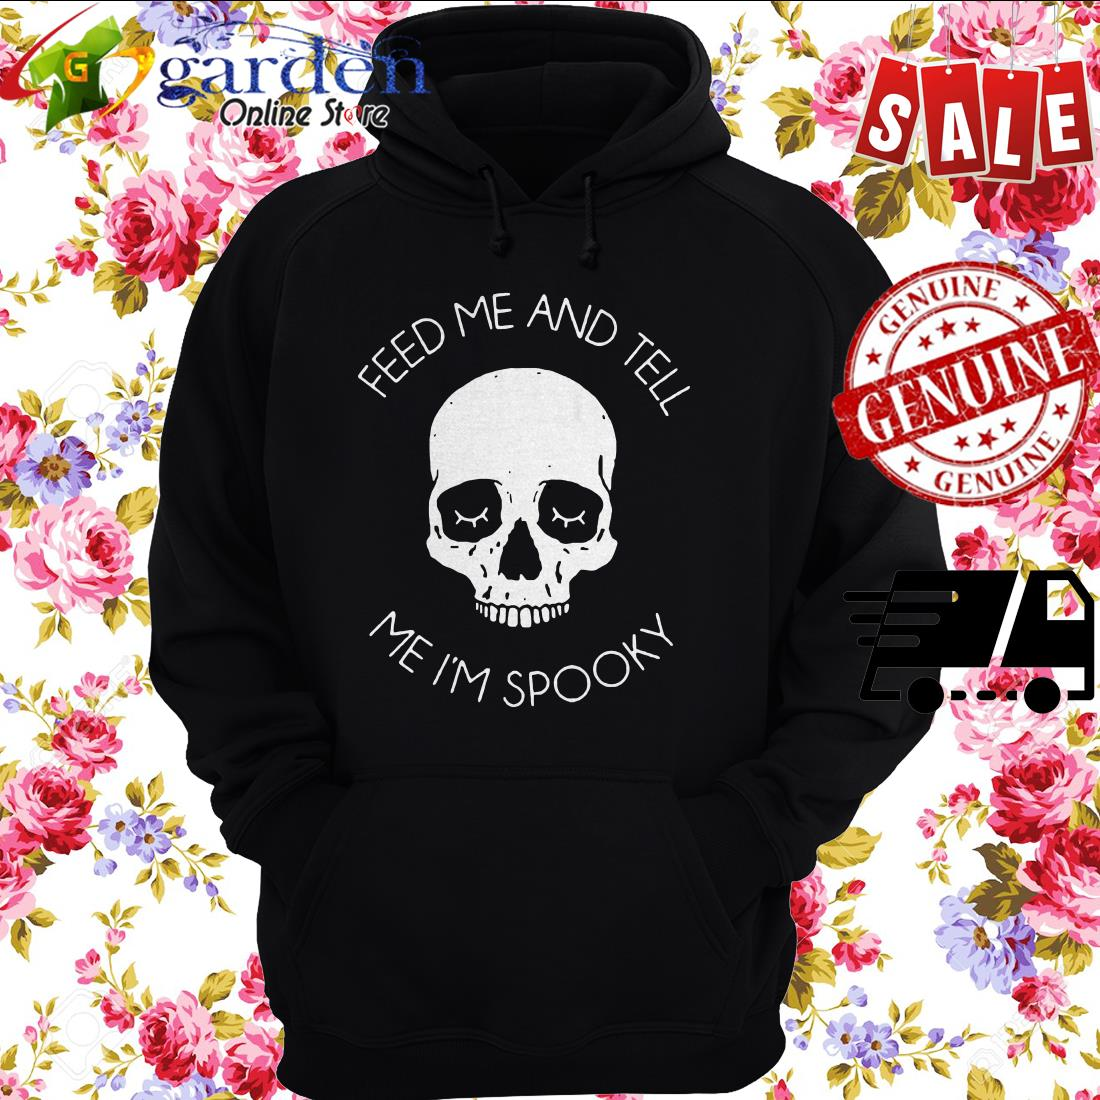 Skull feed Me and tell Me I'm spooky hoodie